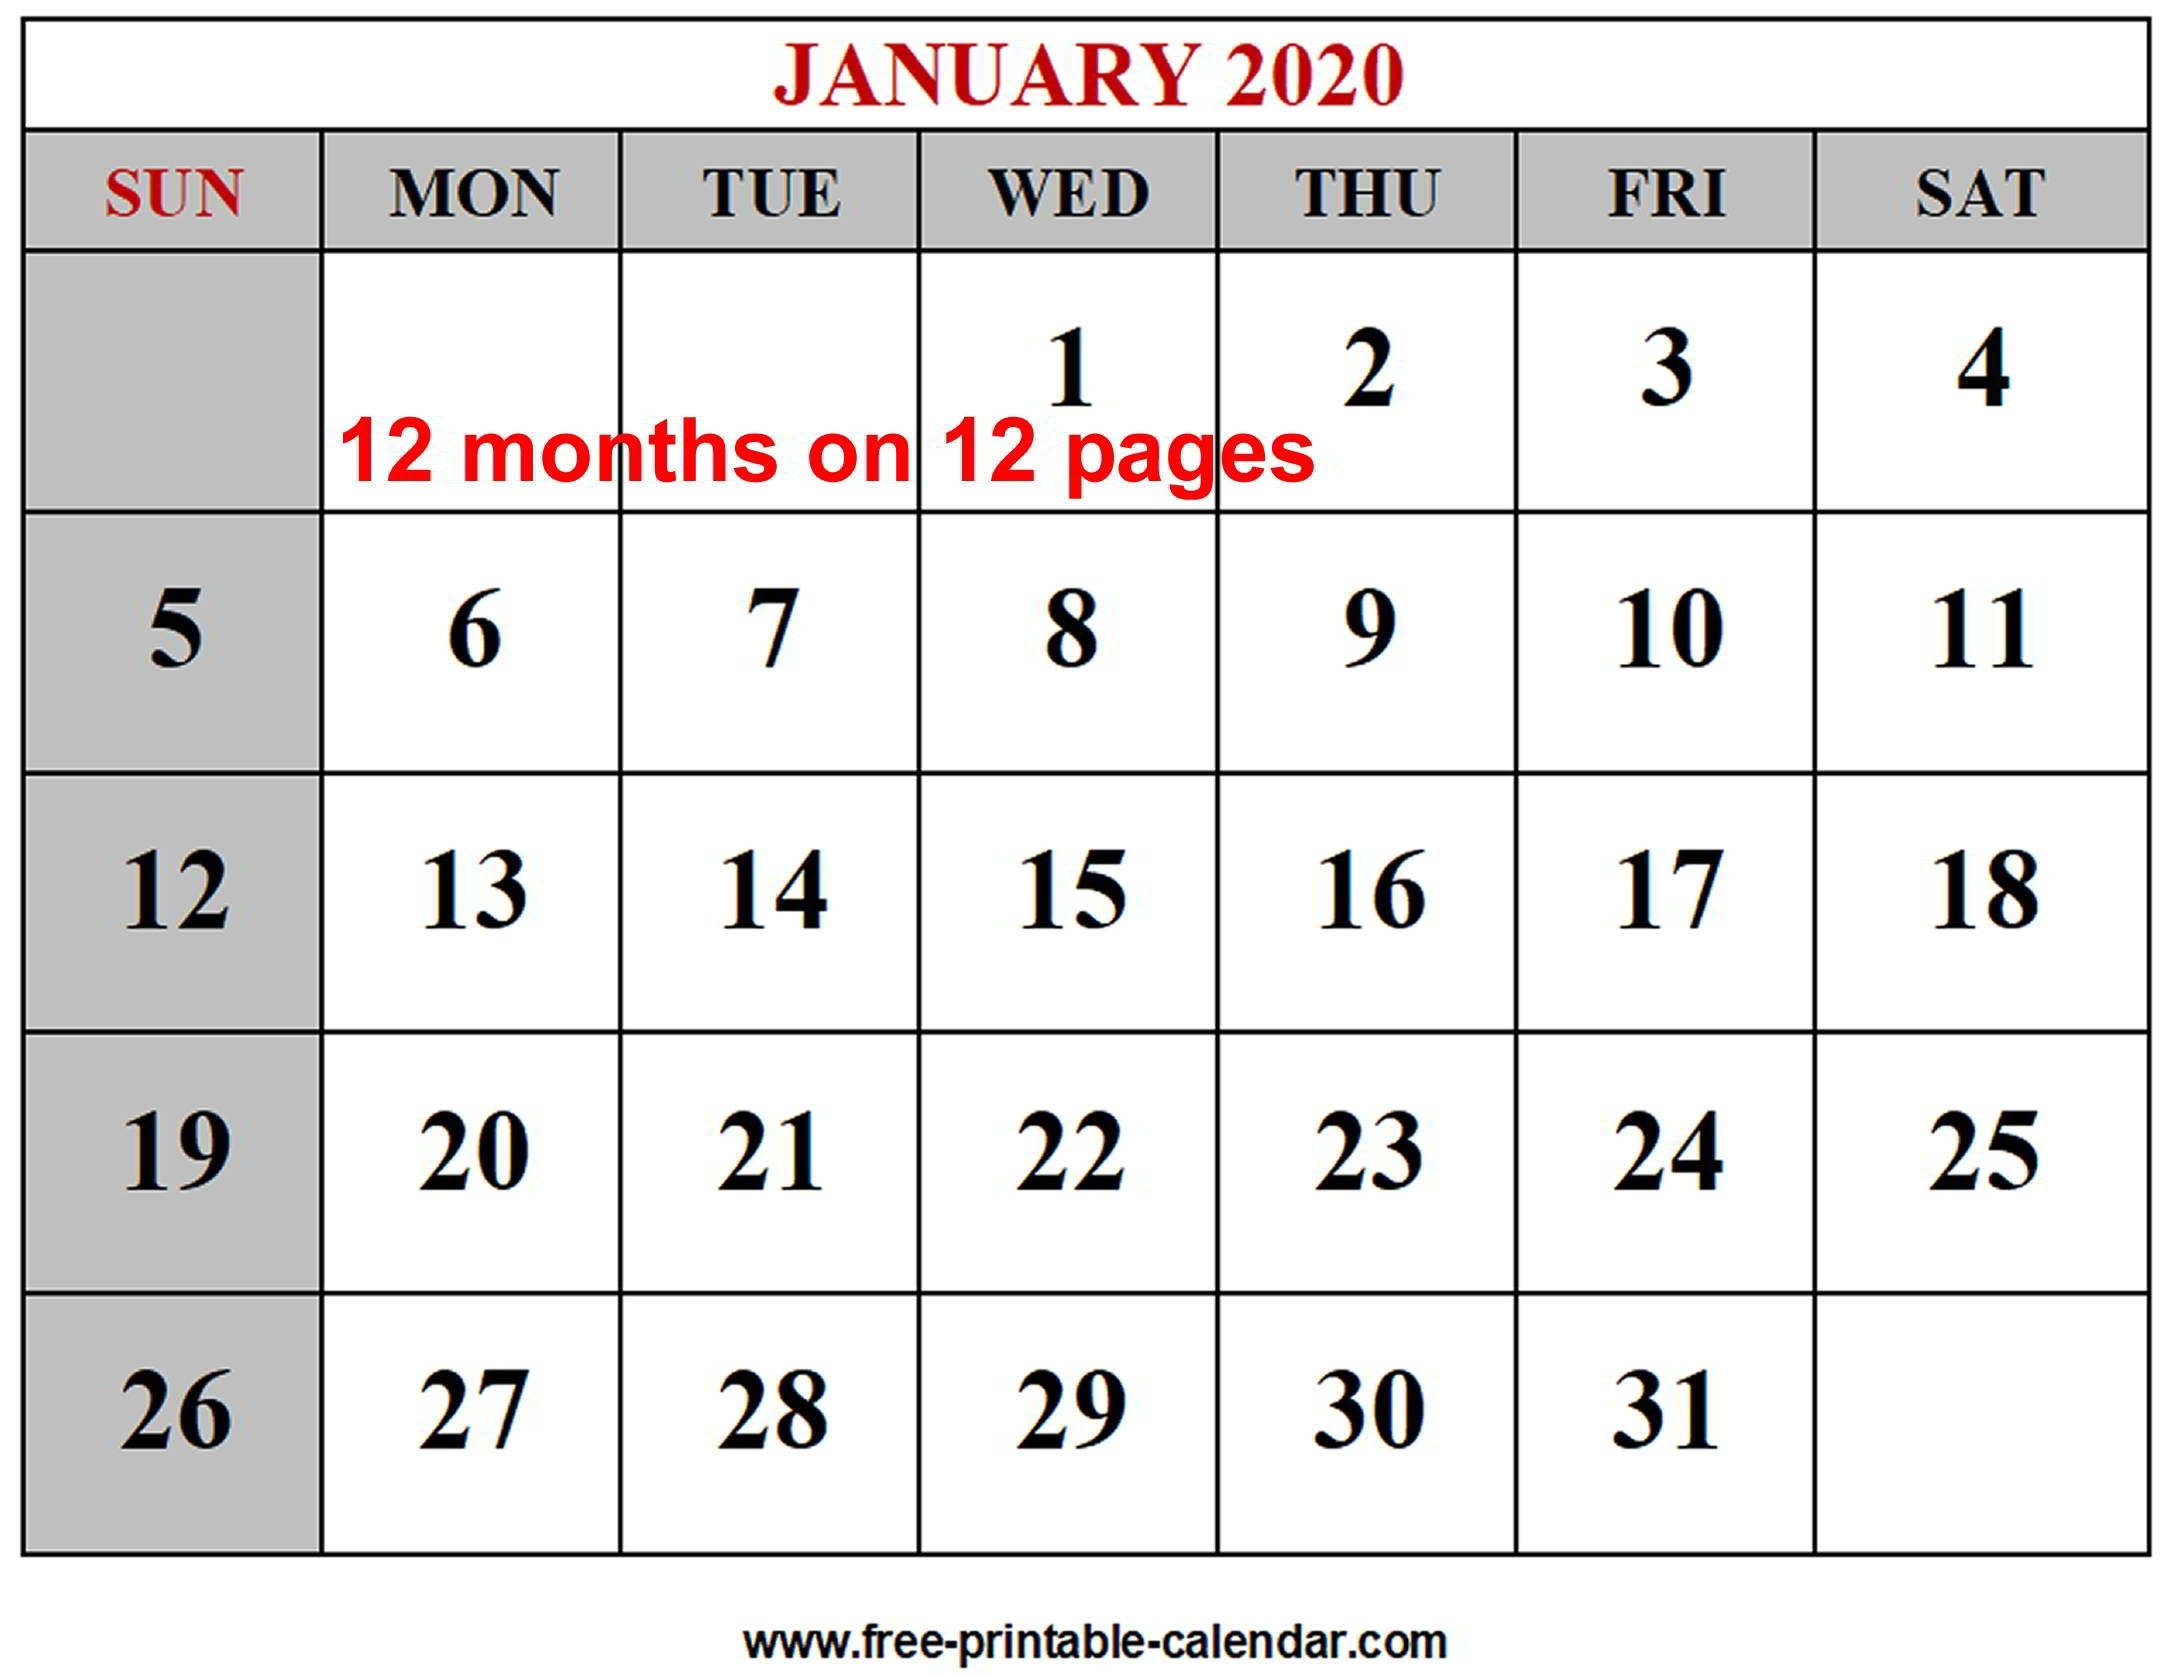 Year 2020 Calendar Templates - Free-Printable-Calendar-Monthly Calendar Sheets 2020